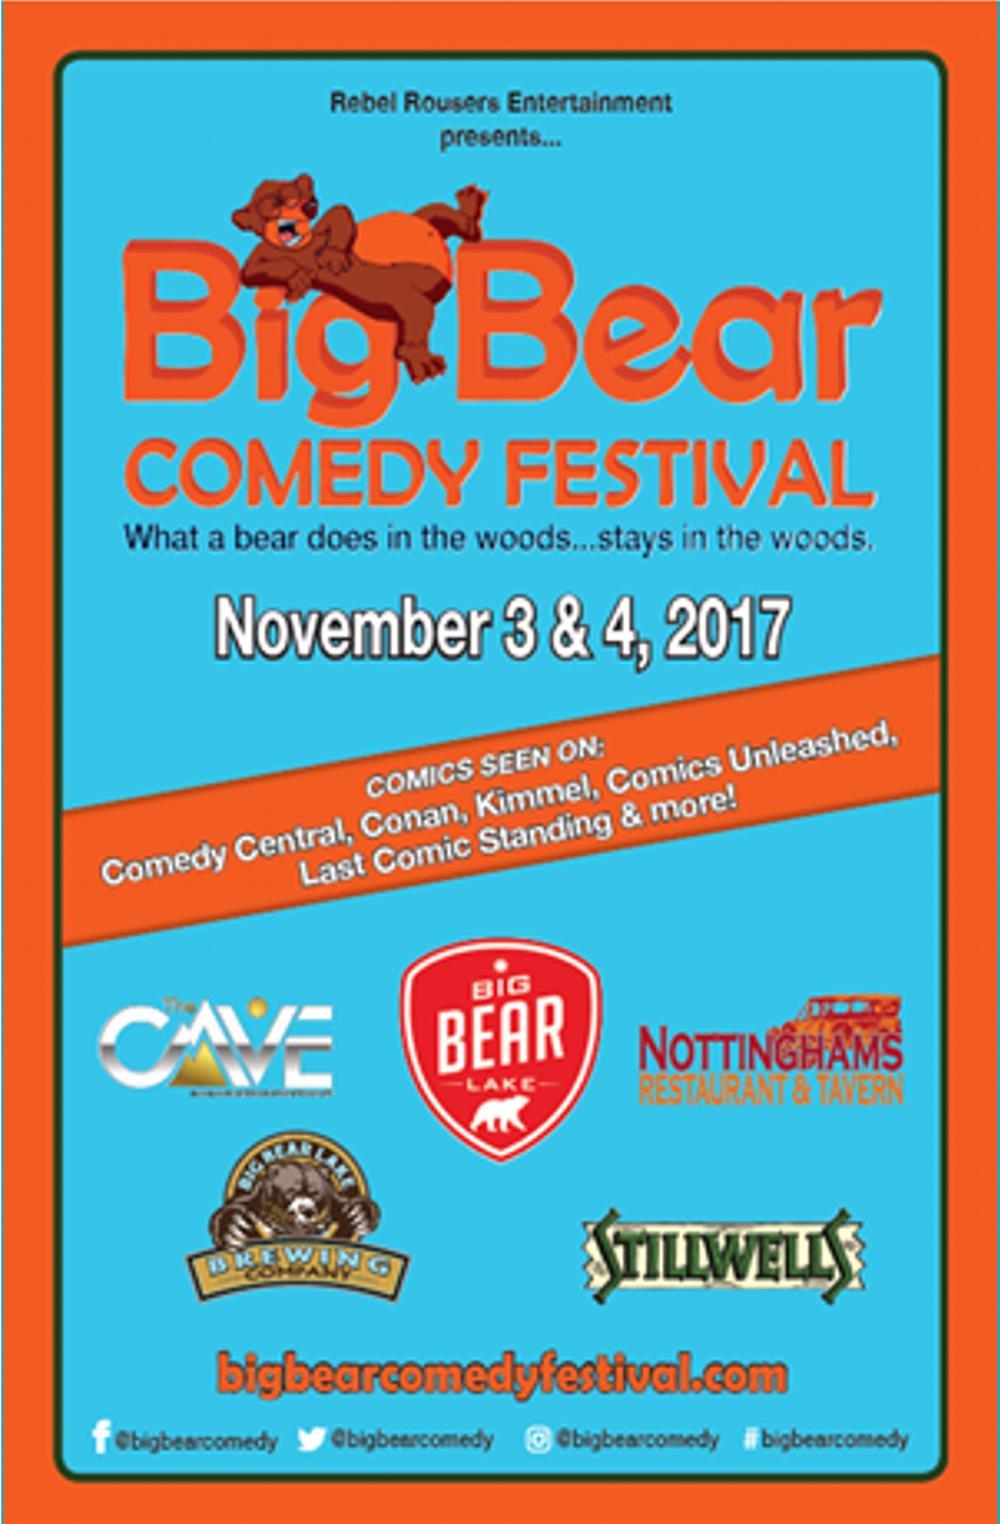 Big Bear Comedy Festival